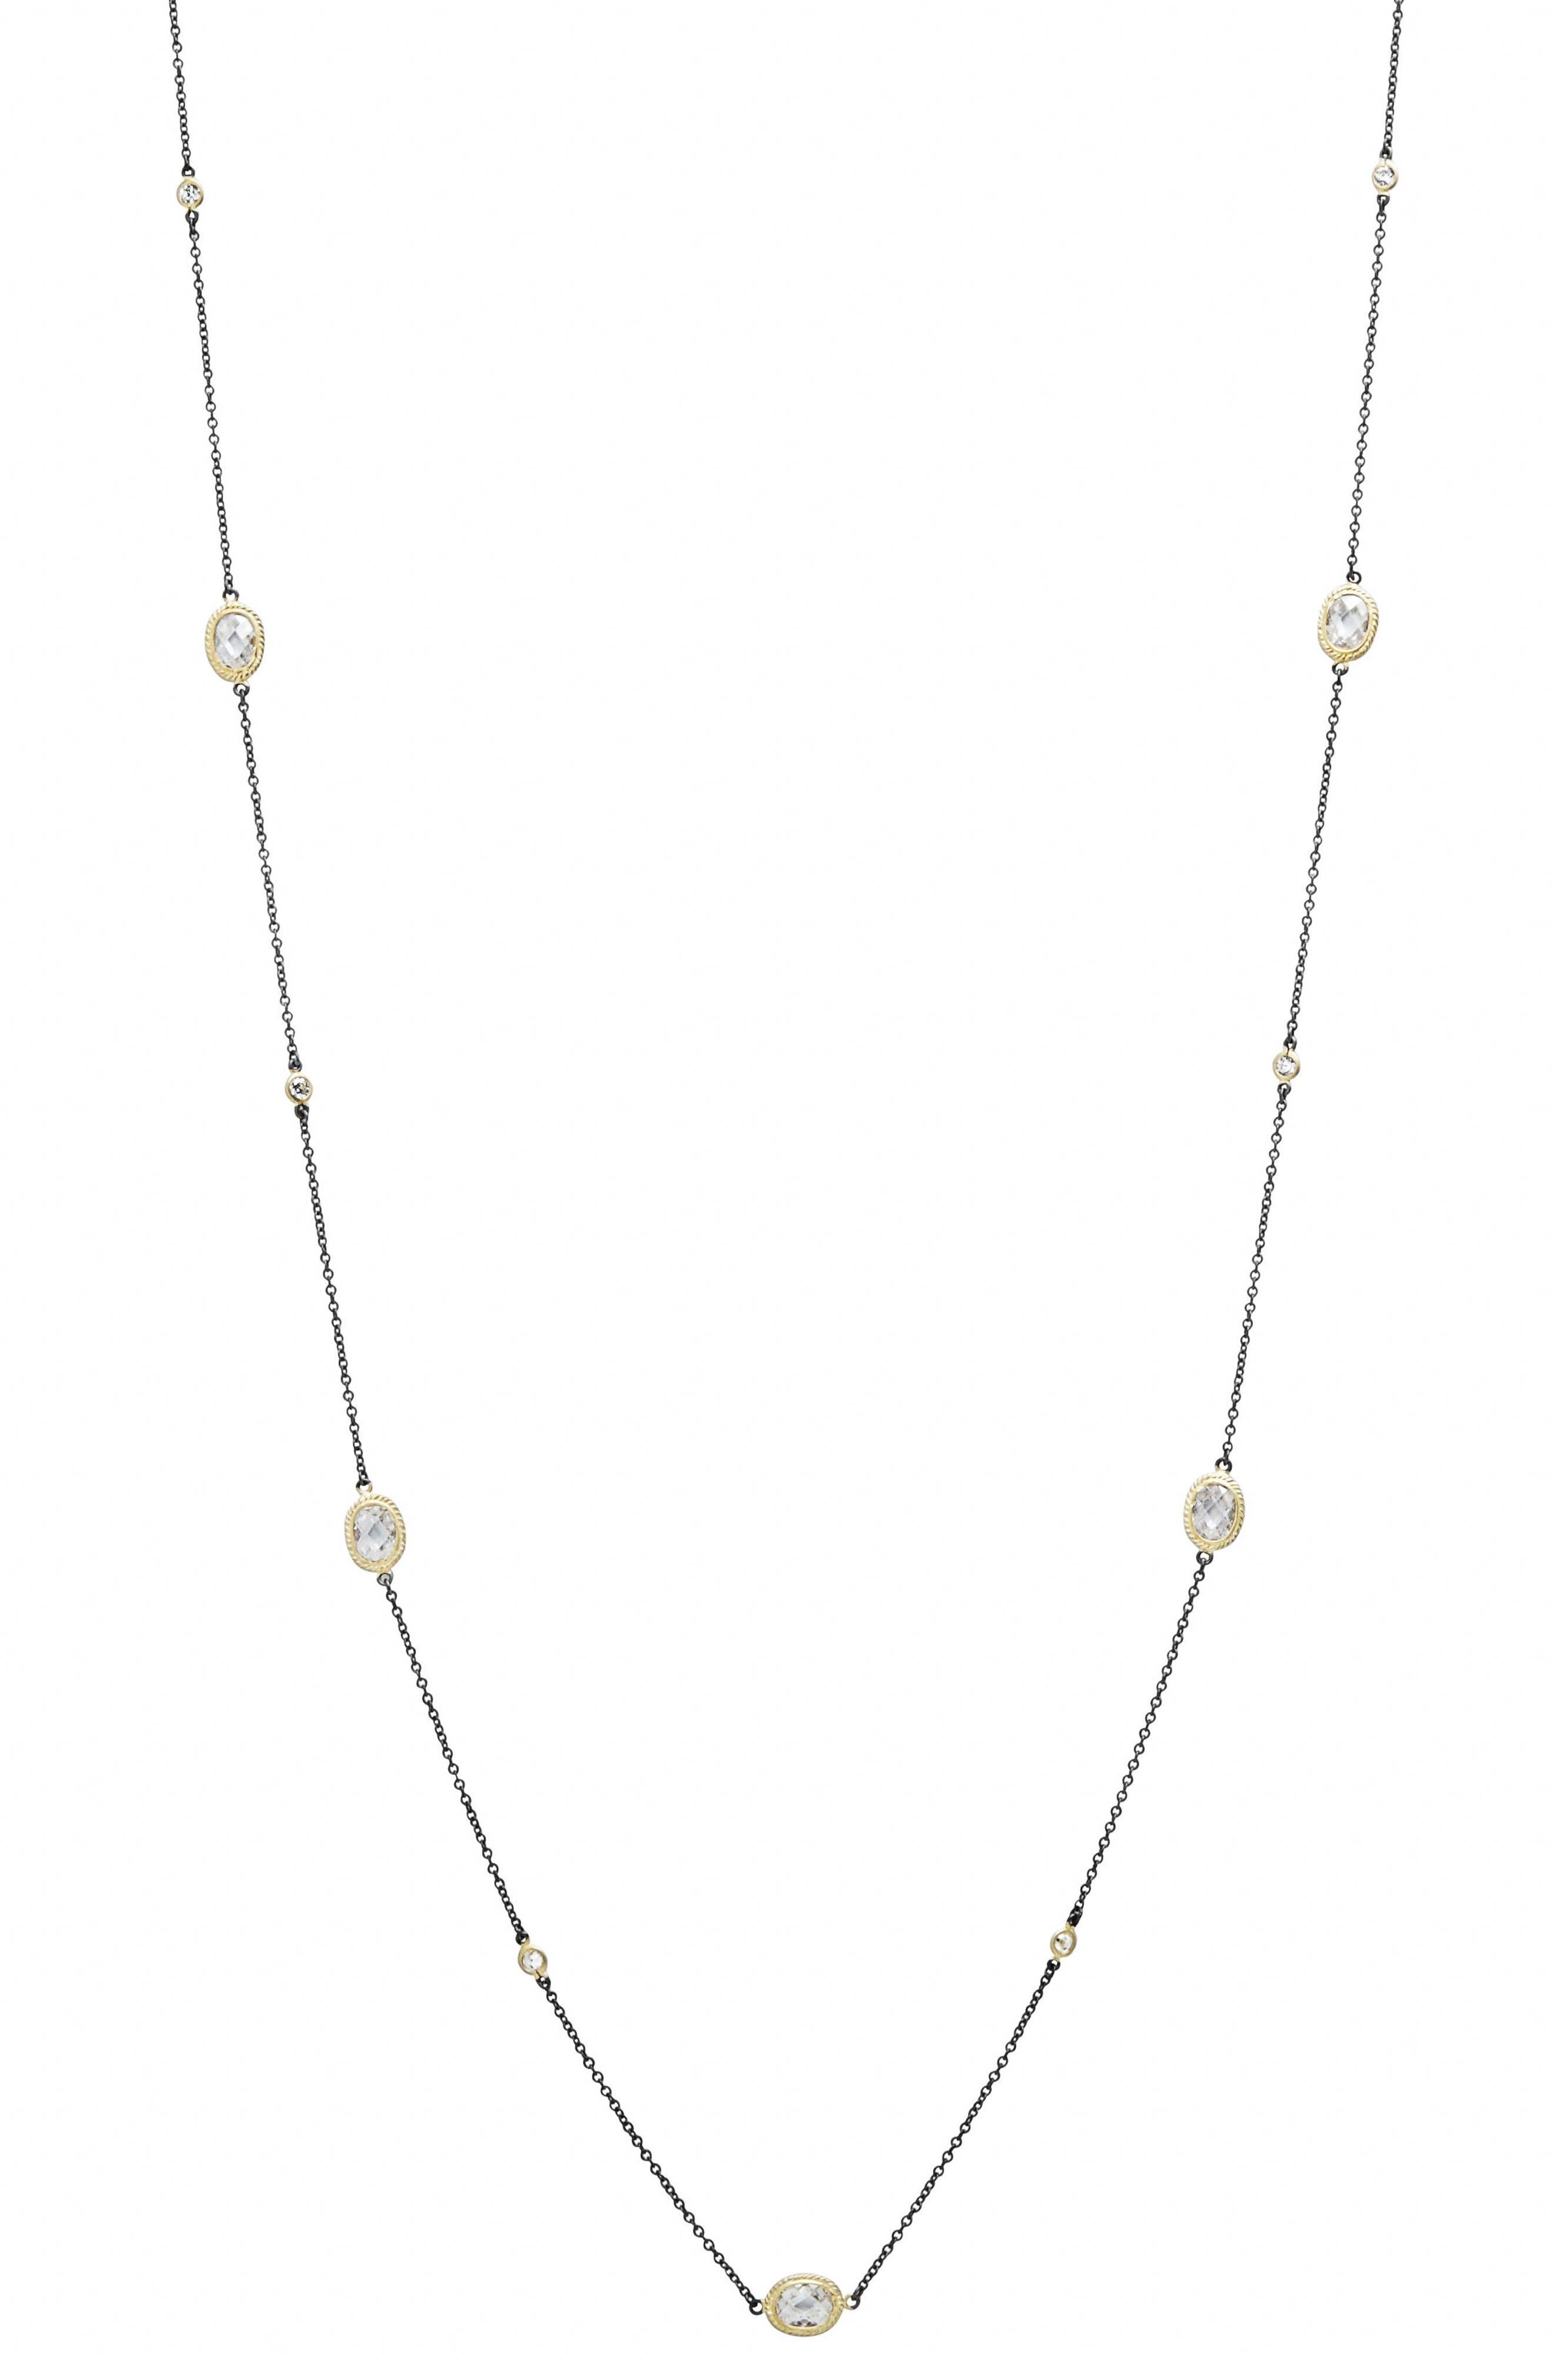 FREIDA ROTHMAN Signature Radiance Wrap Necklace